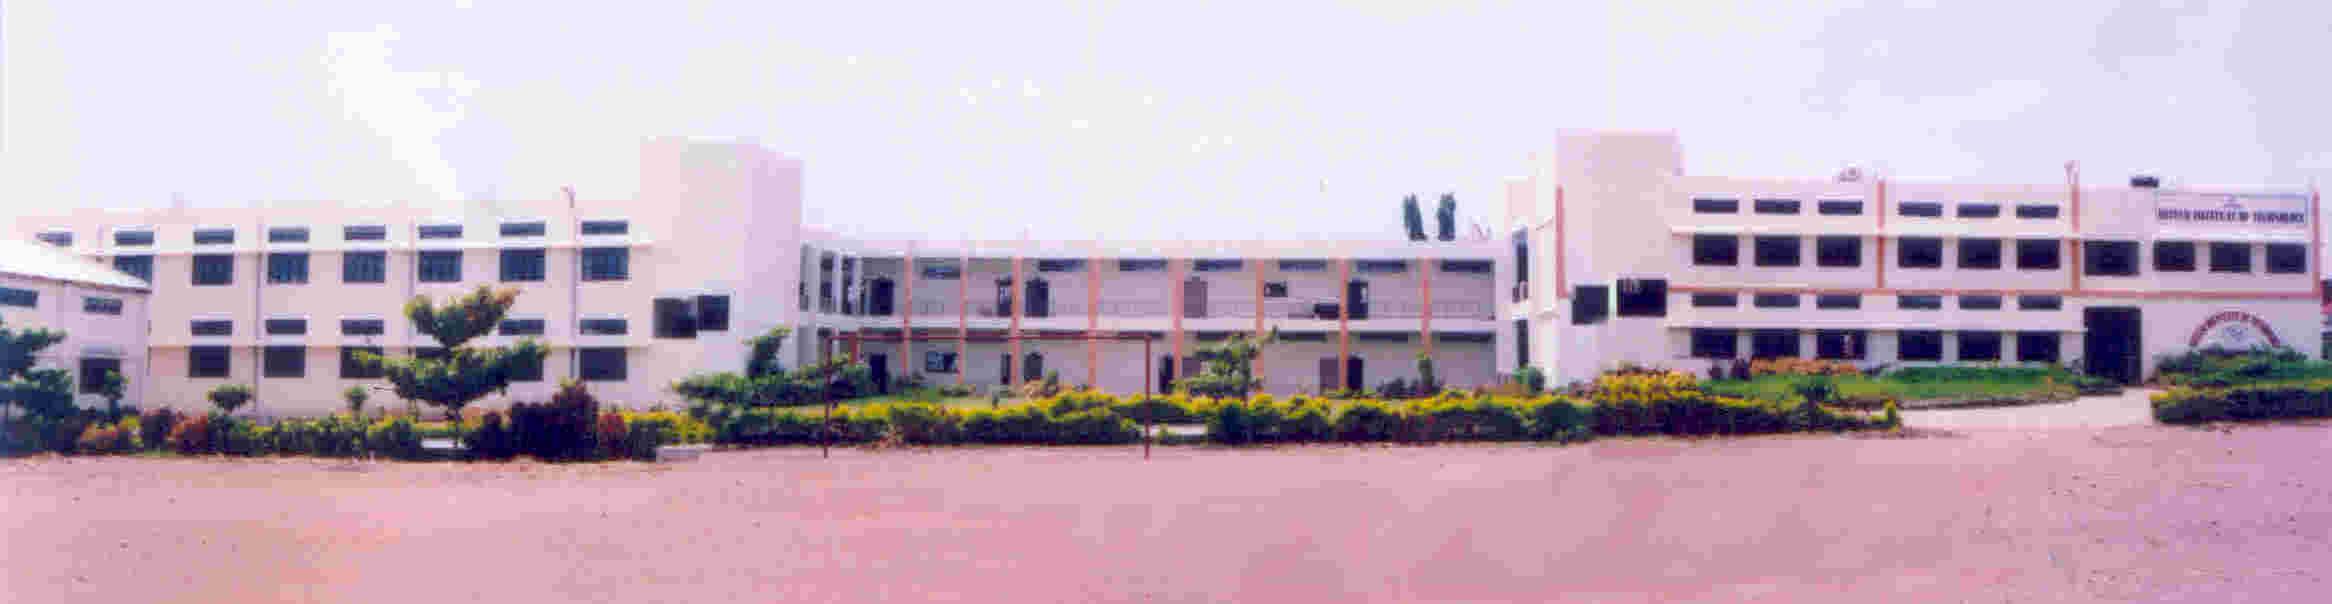 Hi Tech Institute of Technology Photos